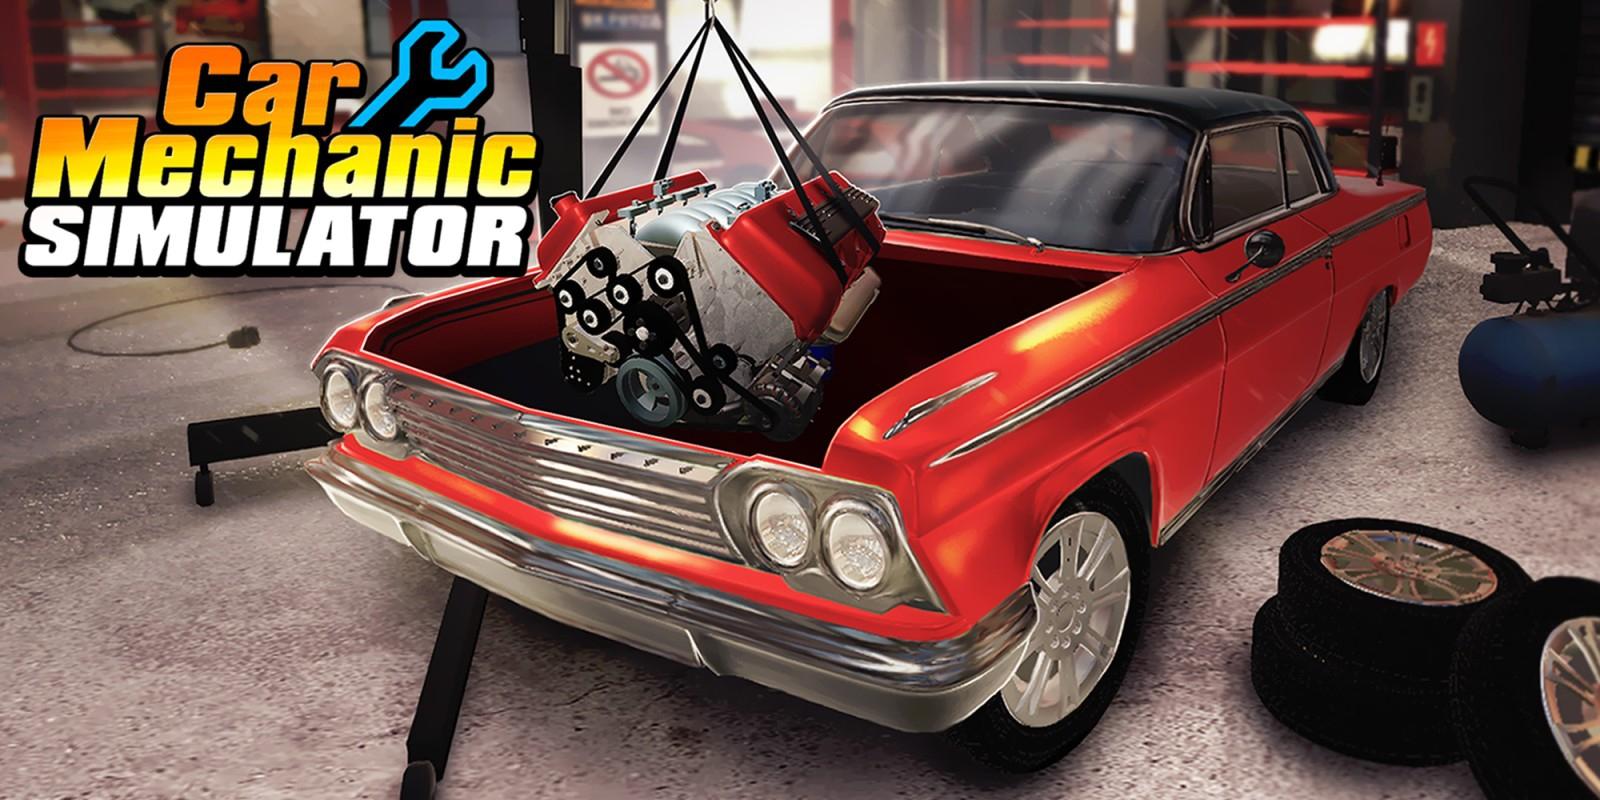 Recensione Car Mechanic Simulator